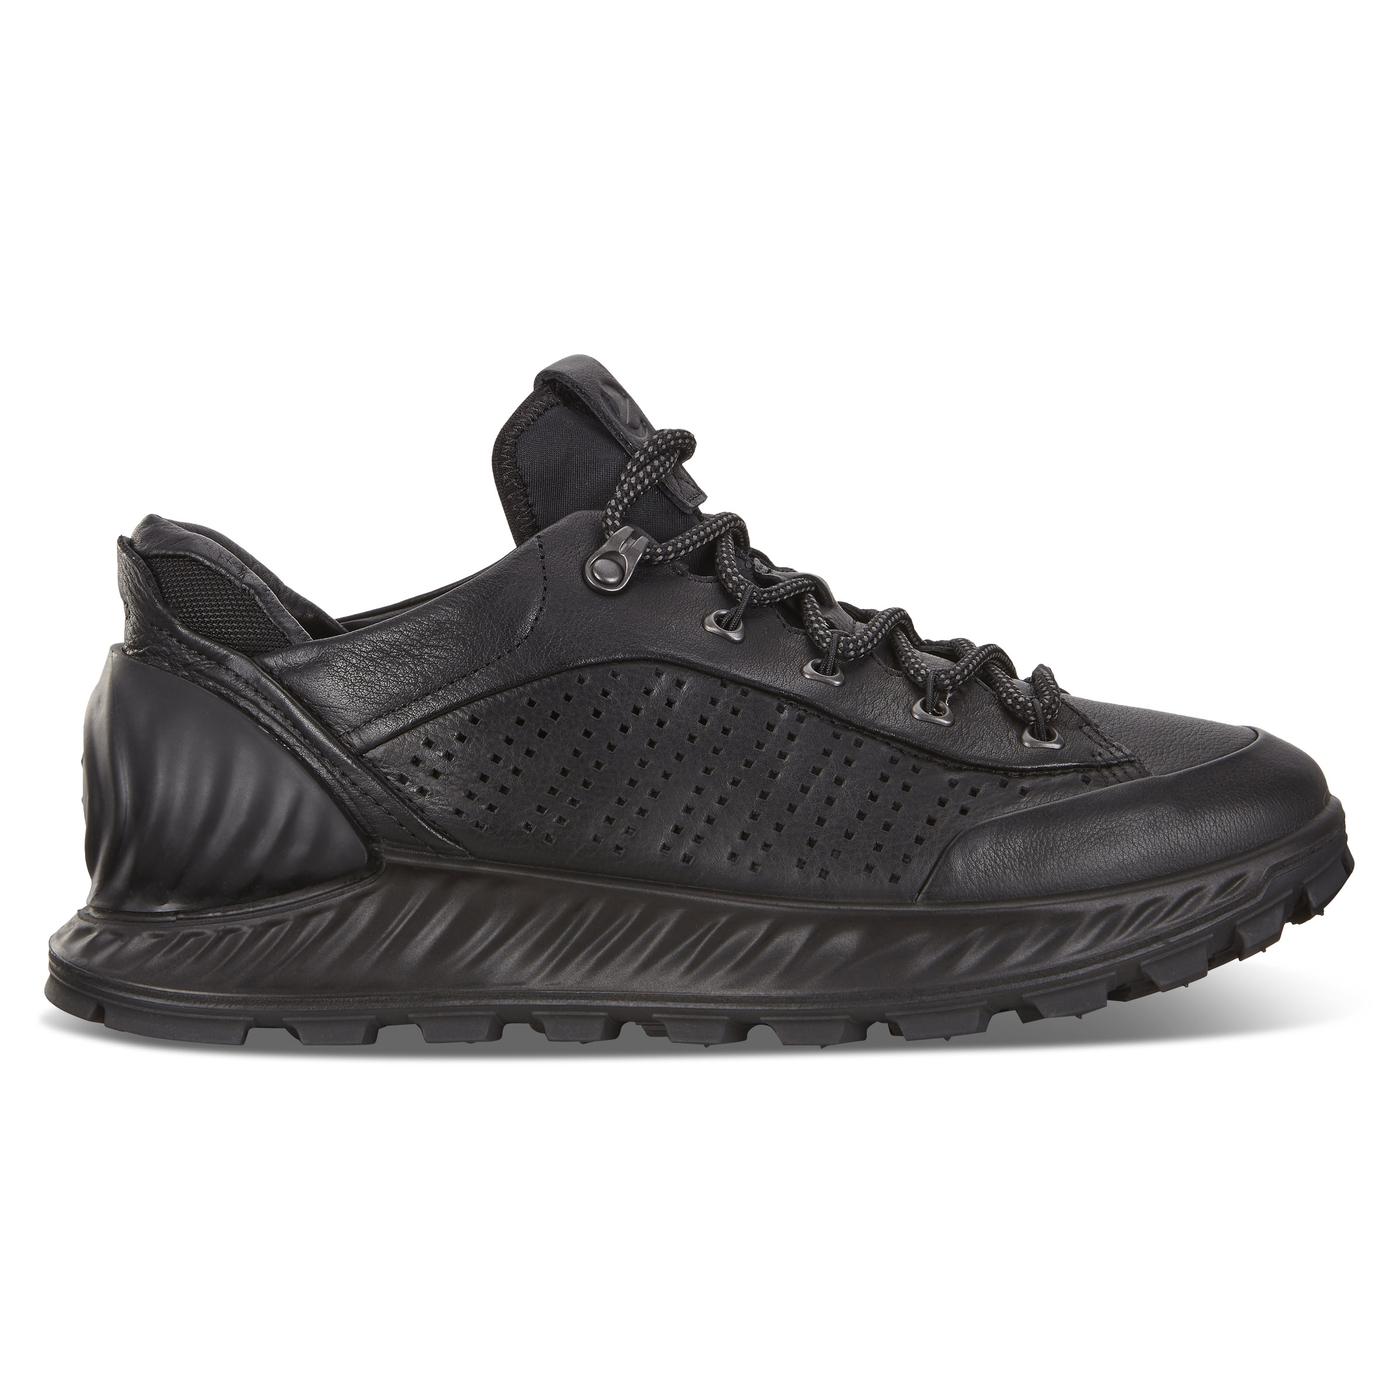 ECCO EXOSTRIKE Mens Outdoor Sneaker Low-Cut